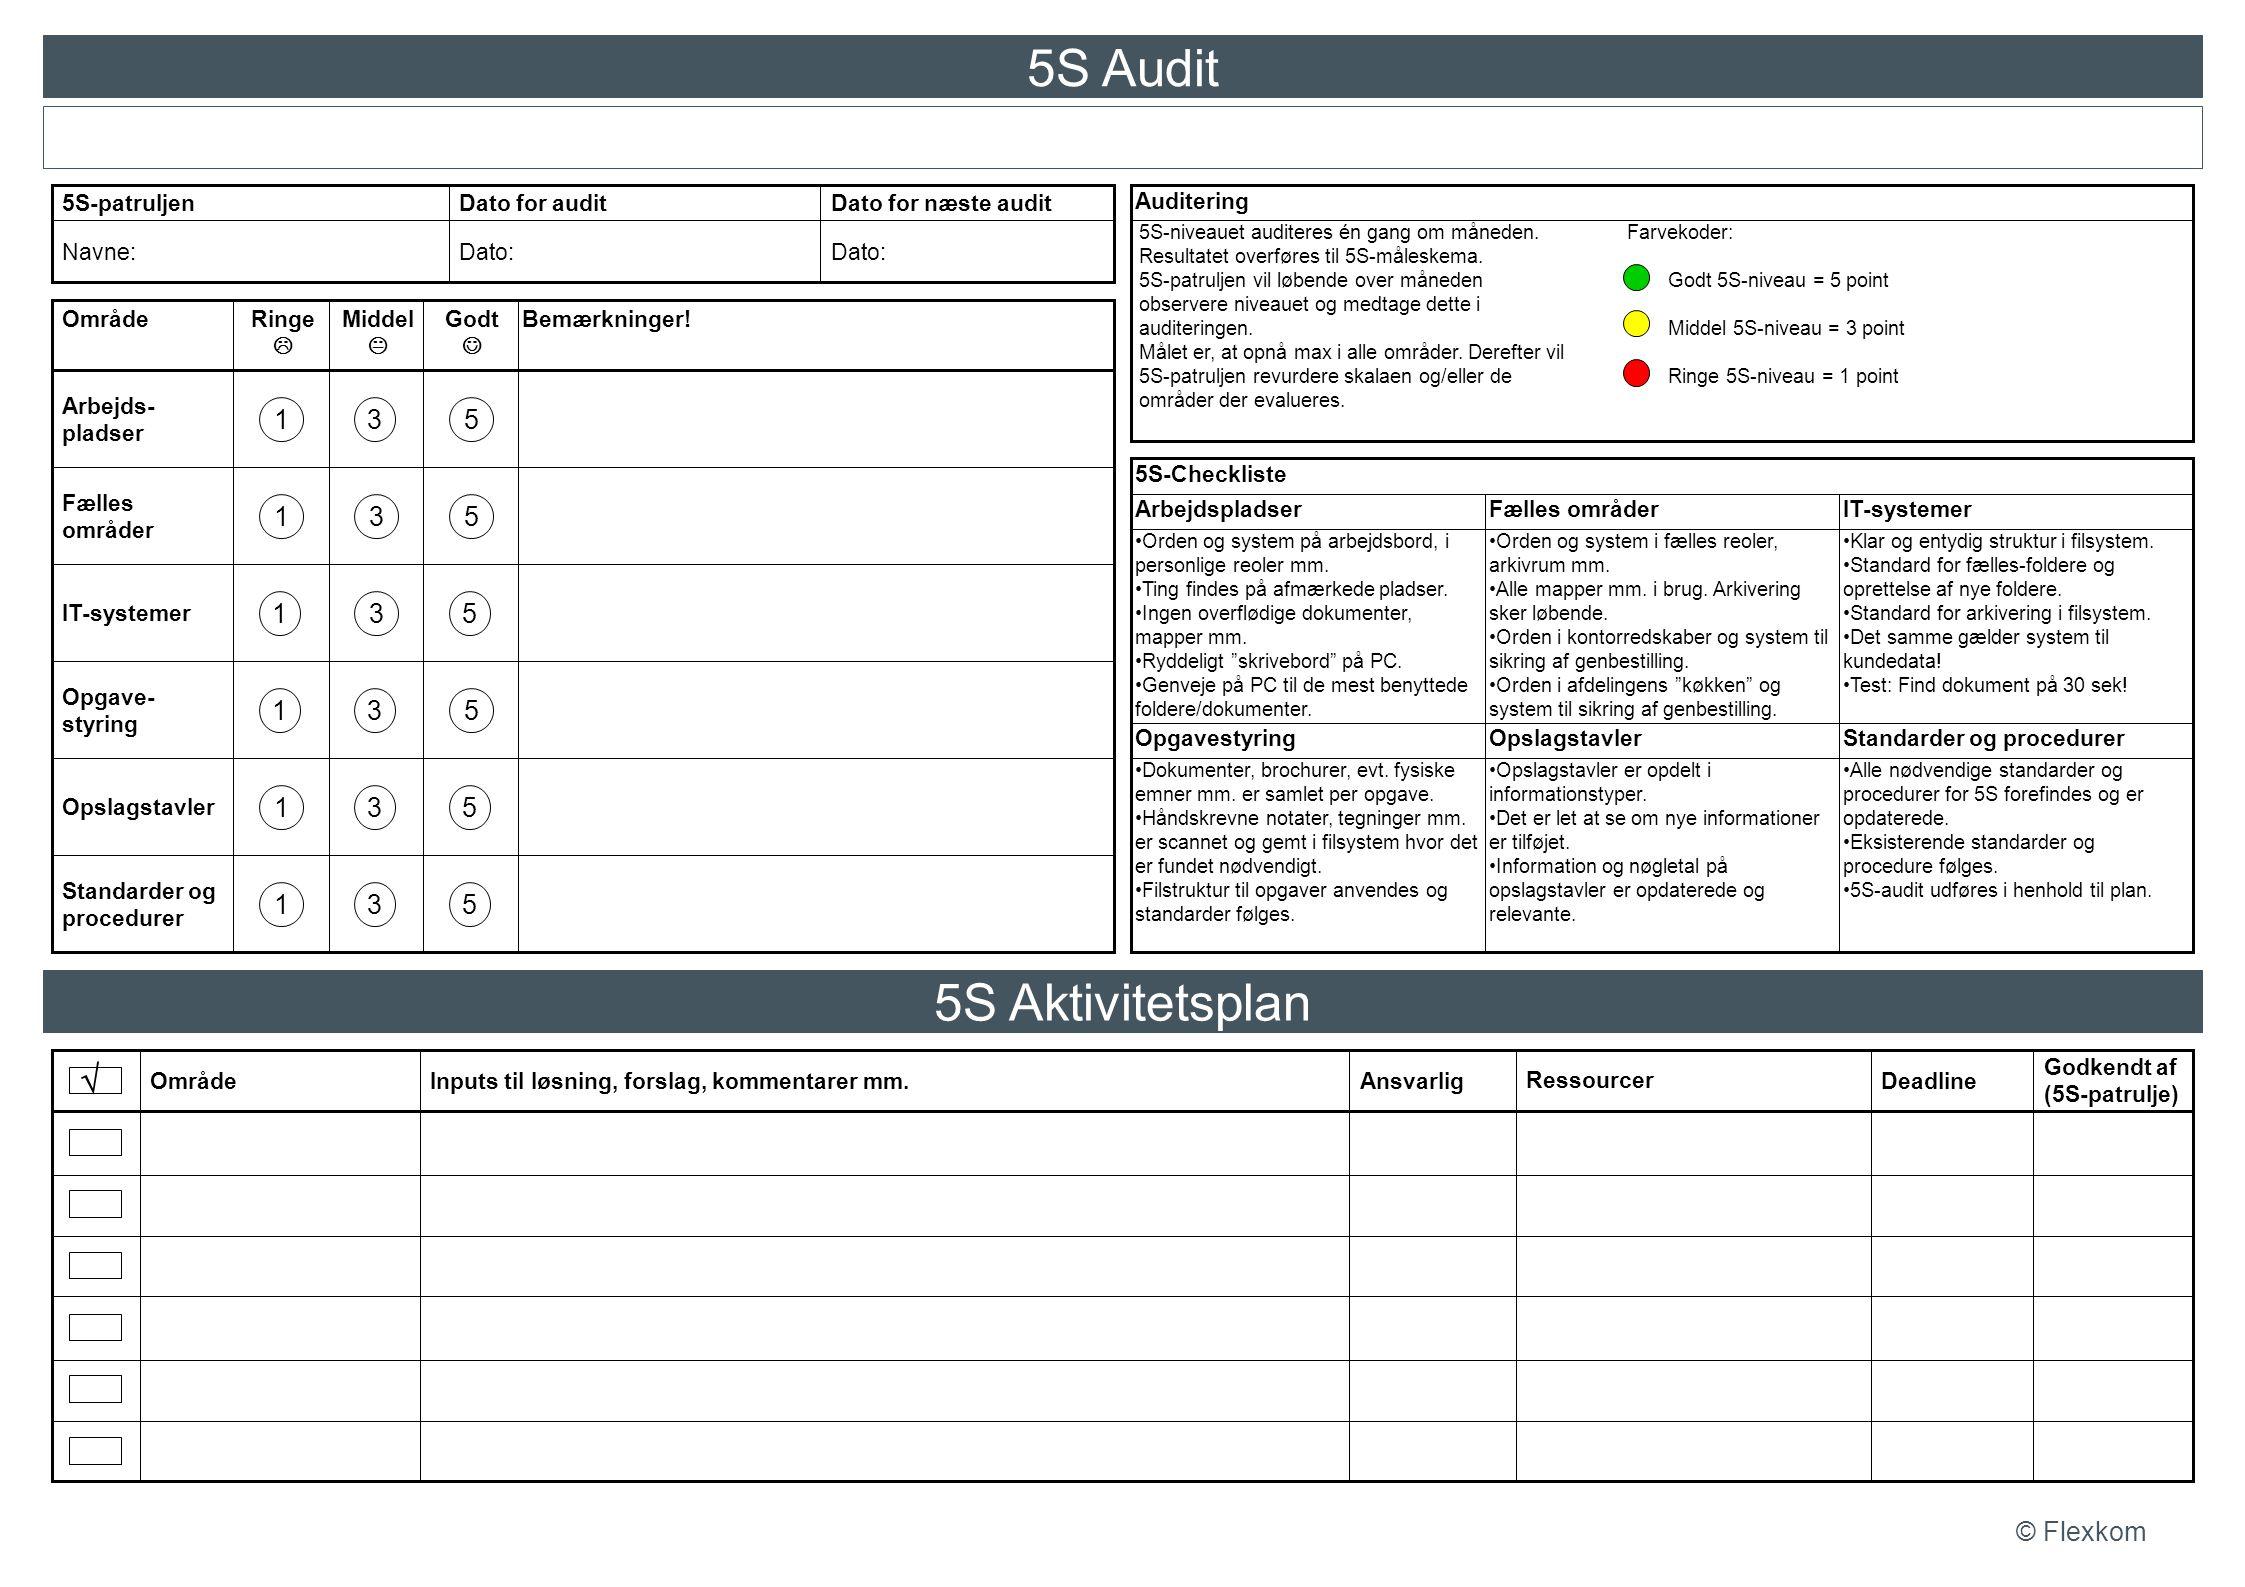 5S Audit 5S Aktivitetsplan  1 3 5 1 3 5 1 3 5 1 3 5 1 3 5 1 3 5